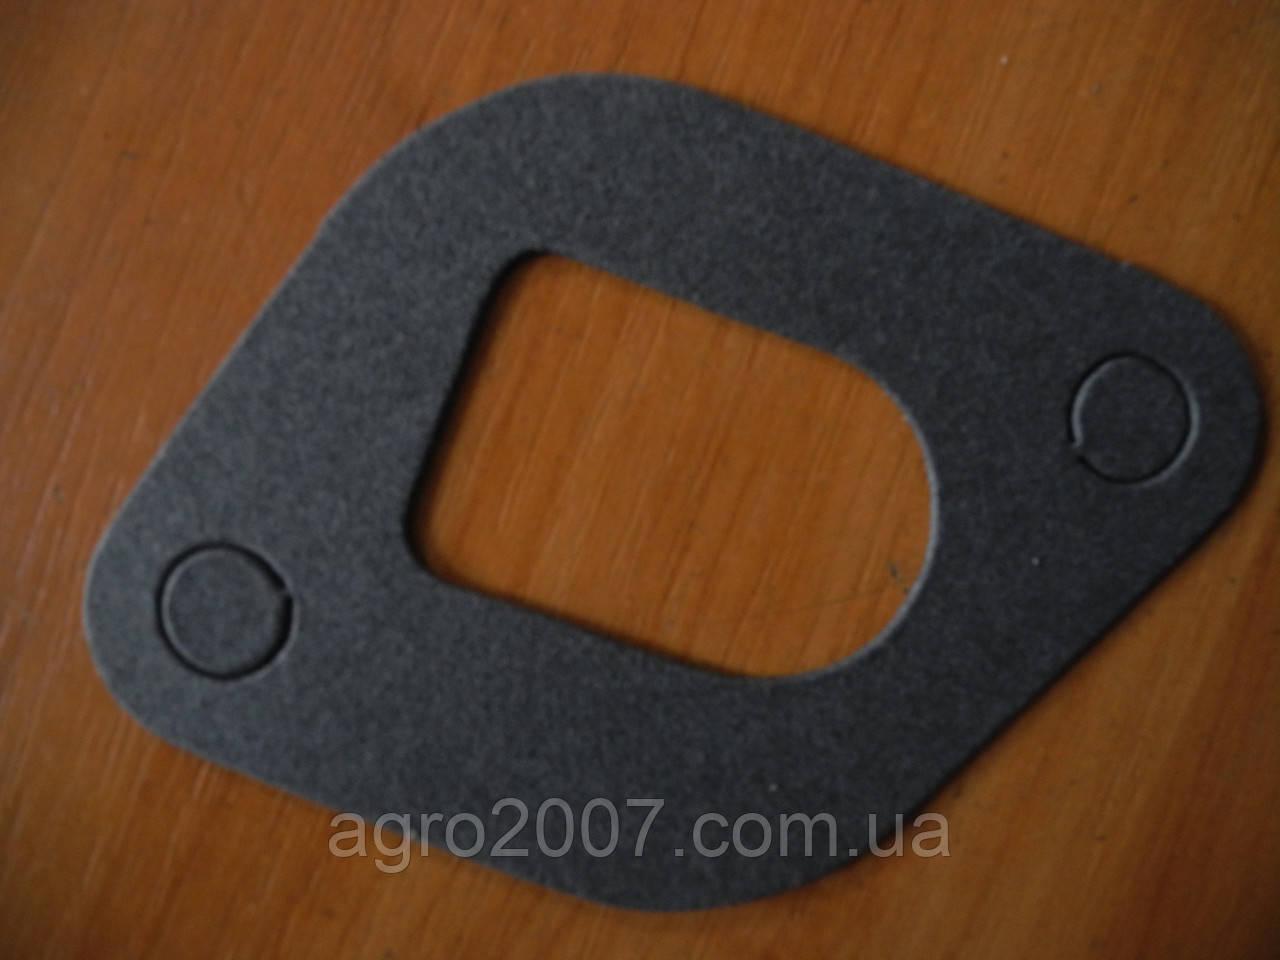 Д11-048 А Прокладка патрубка водяного насоса ЮМЗ